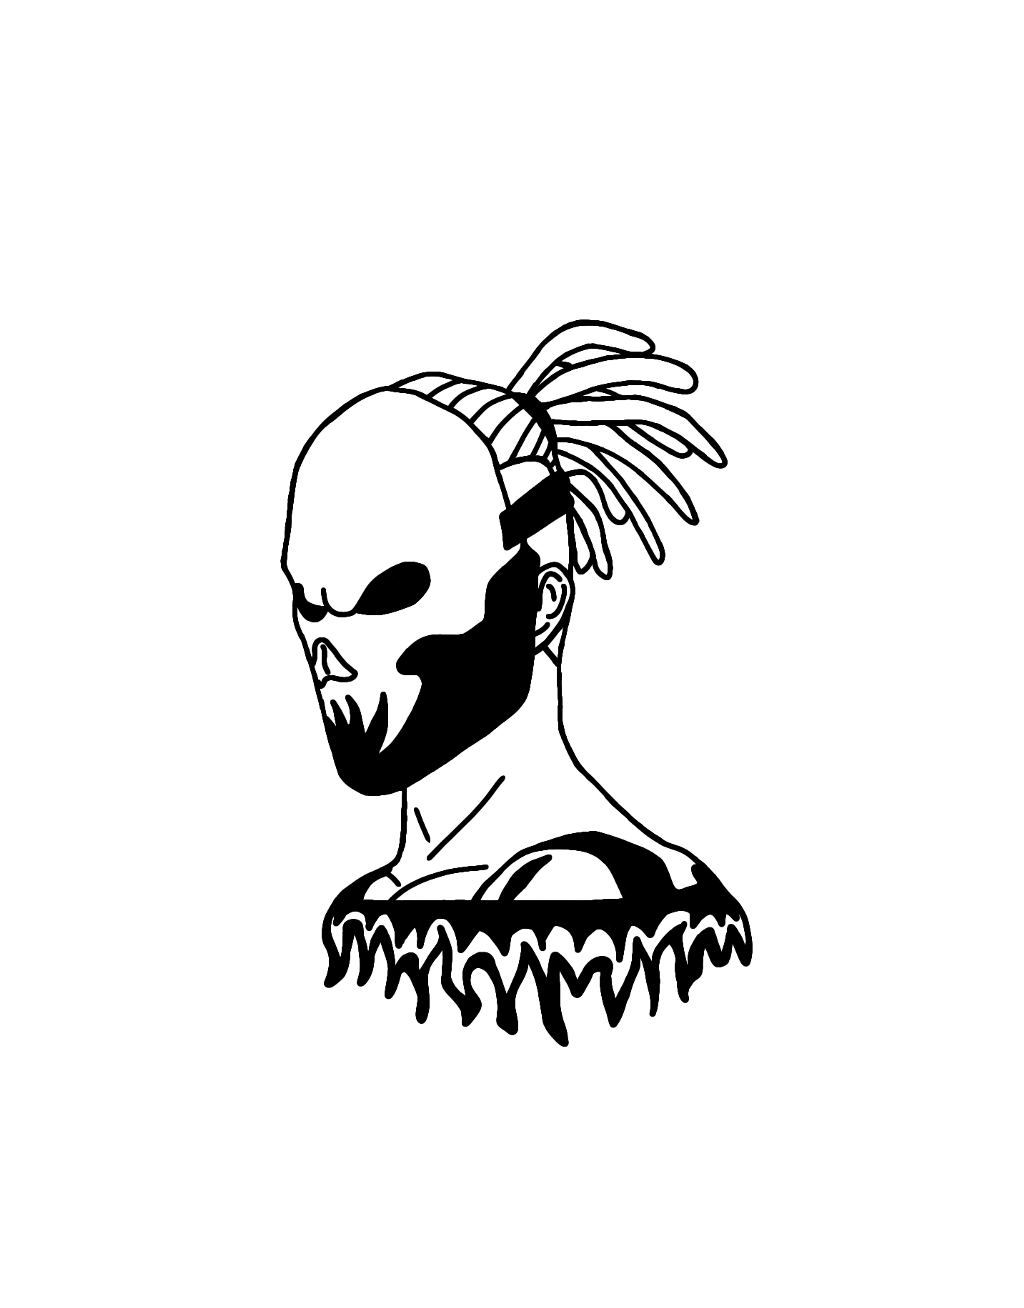 Desenho Feito Por K4dois At K4dois Desenho Feit